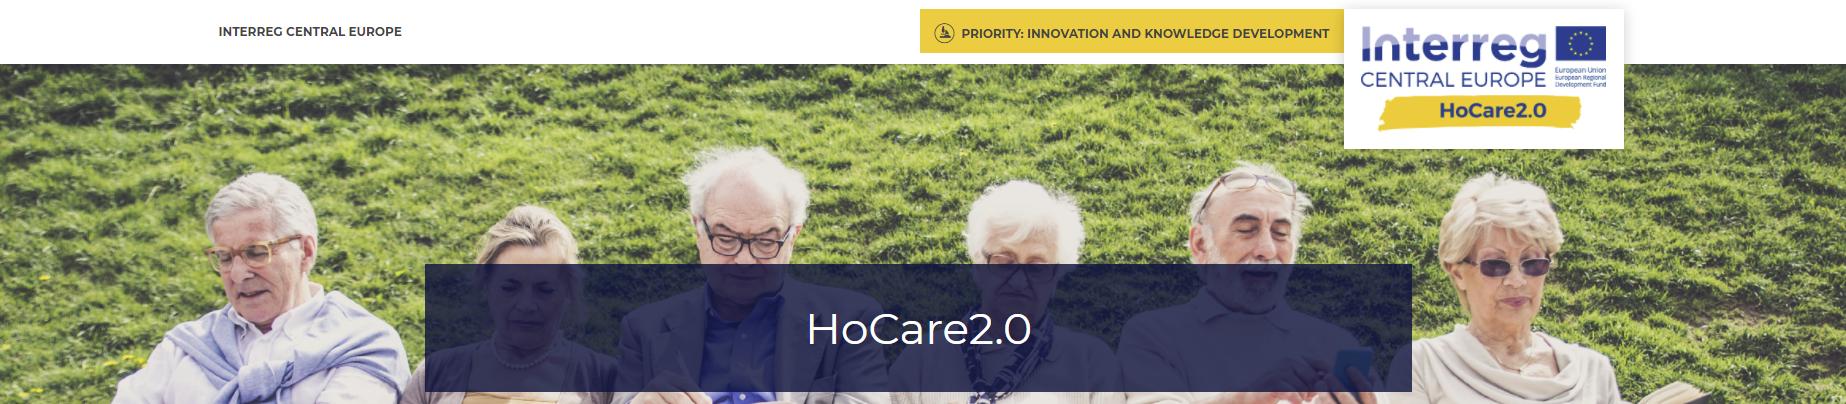 Hocare 2 0